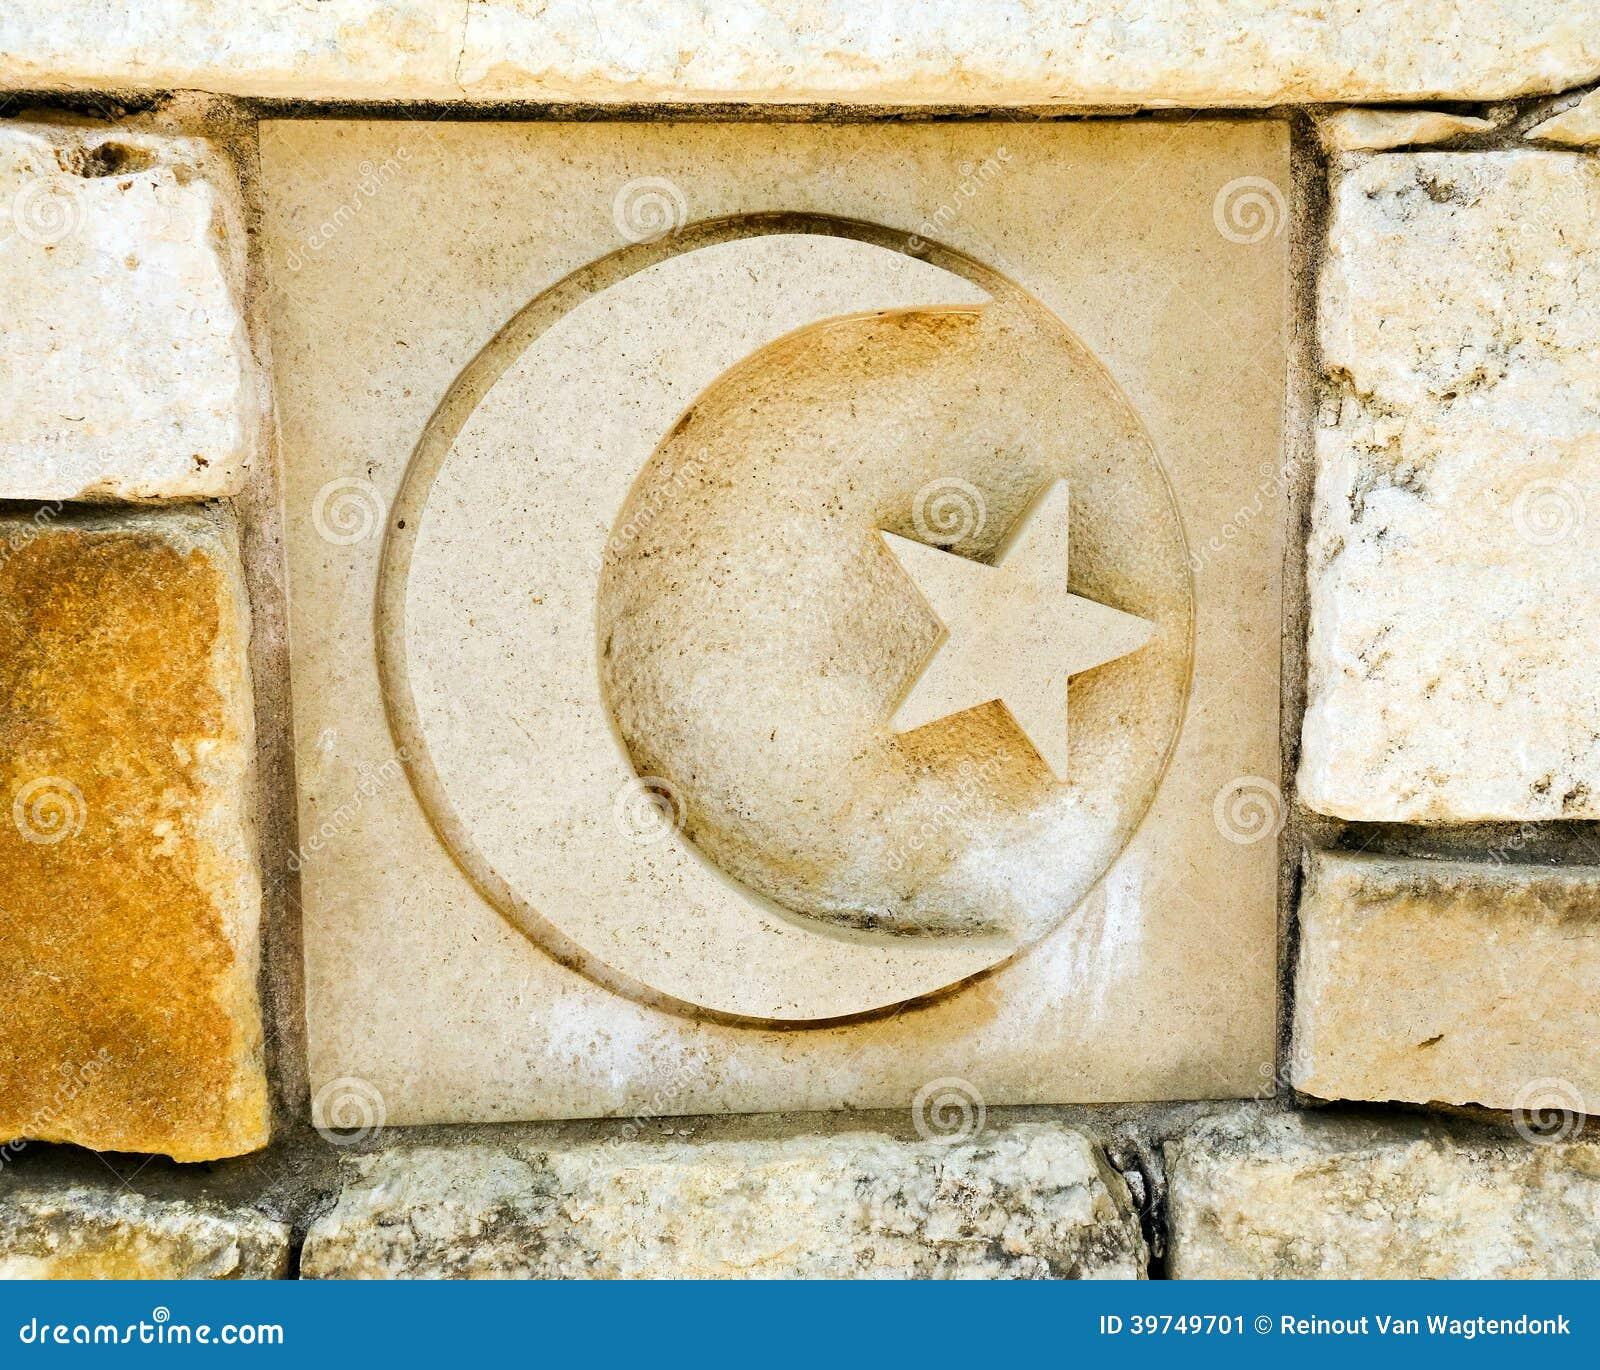 Crescent moon symbol of islam stock image image of koran crescent moon symbol of islam biocorpaavc Gallery